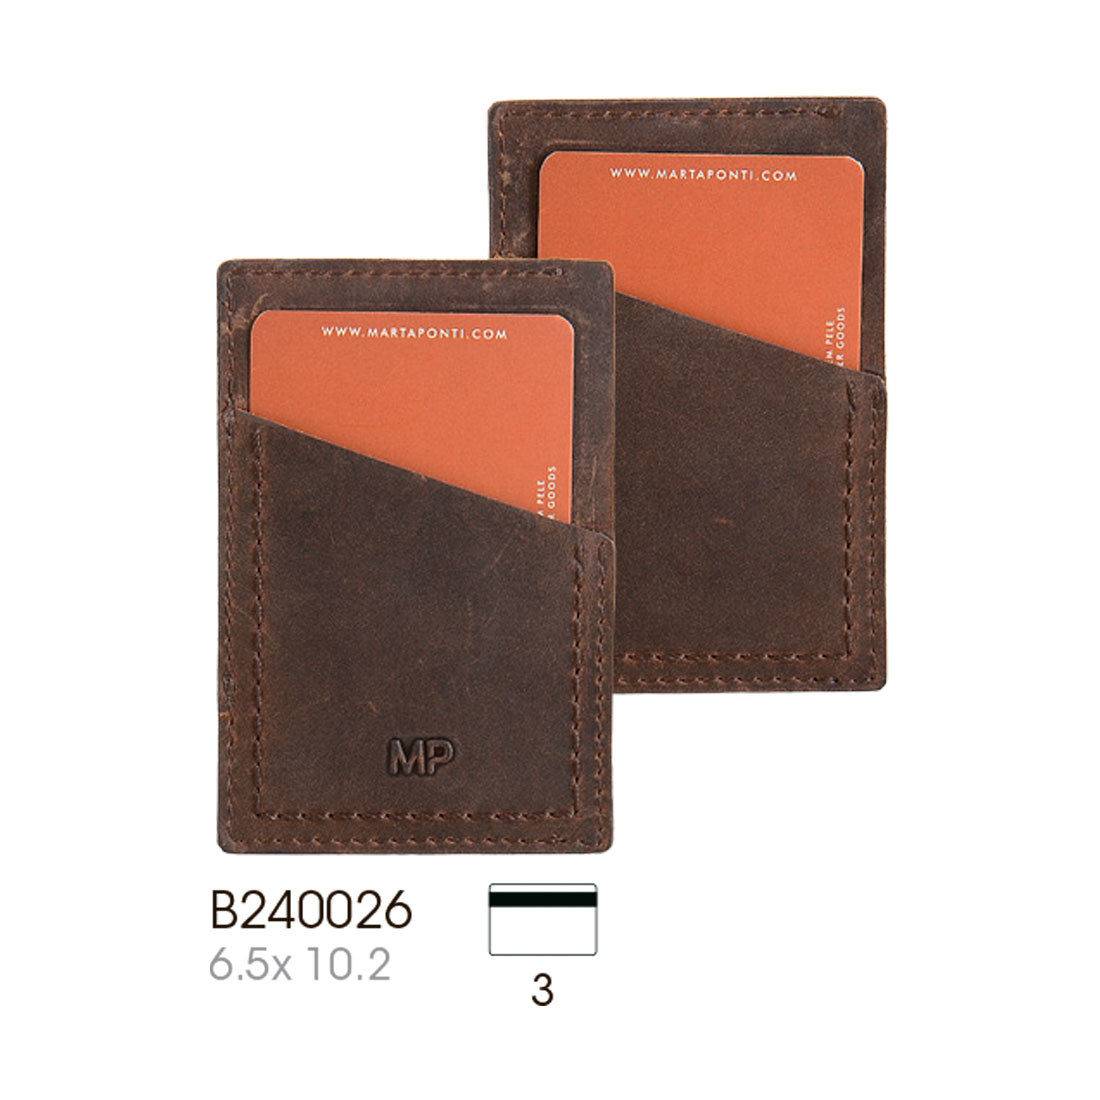 B240026 Cast/Camel - Футляр для карт MP